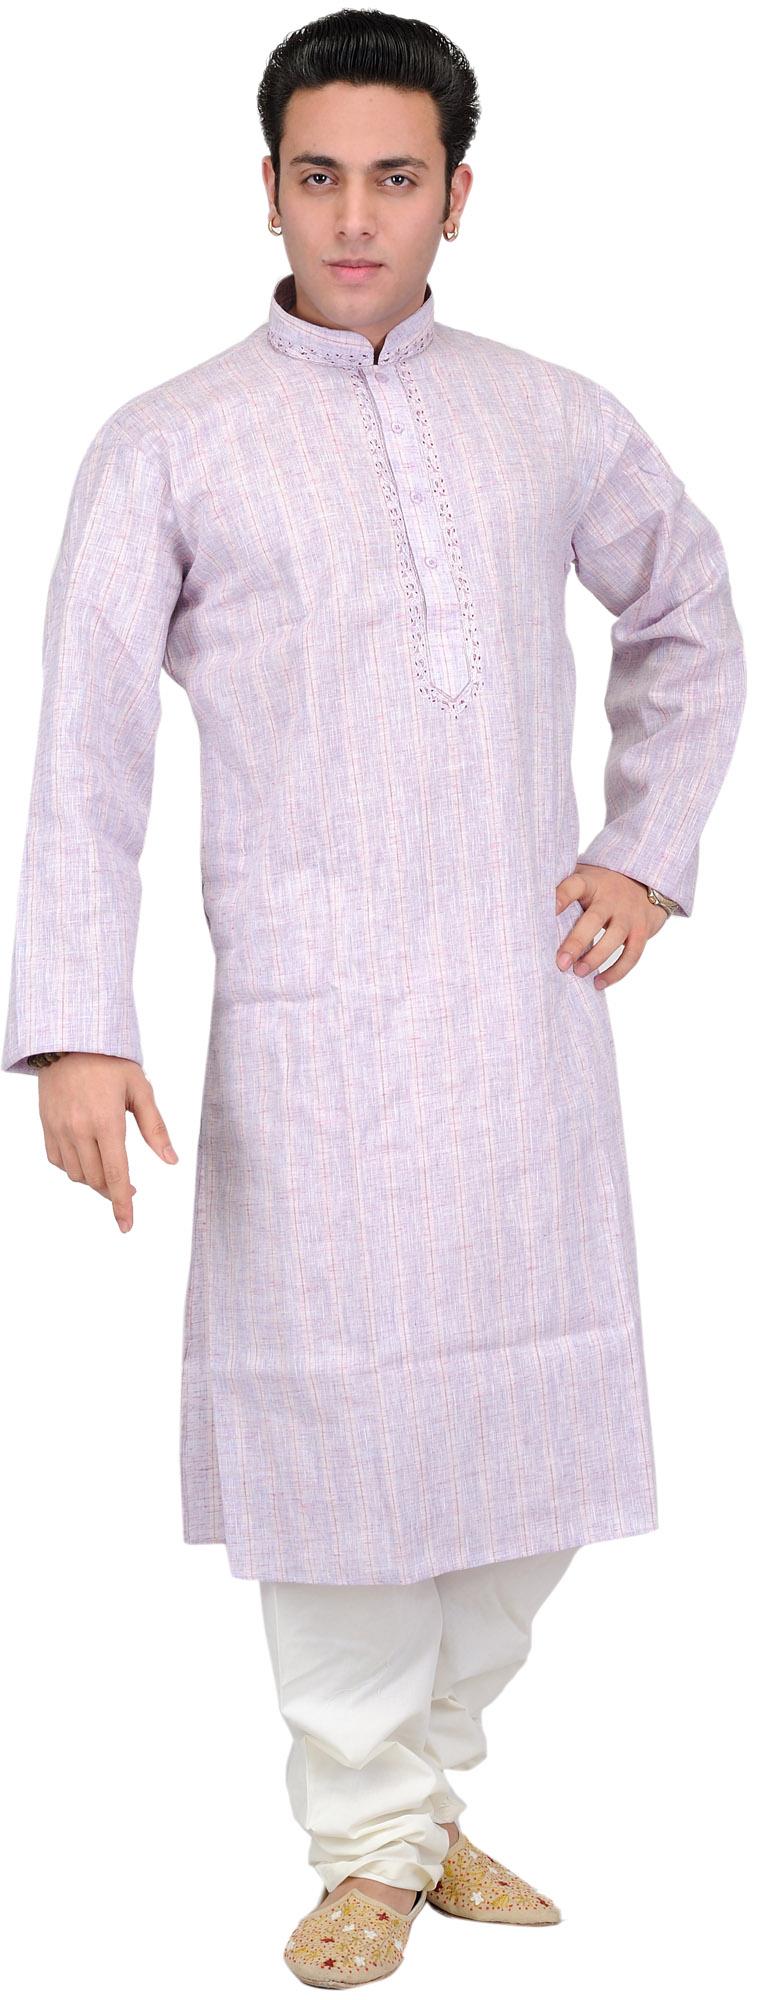 Kurta Pajama Set With Embroidery On Neck And Fine Stripes